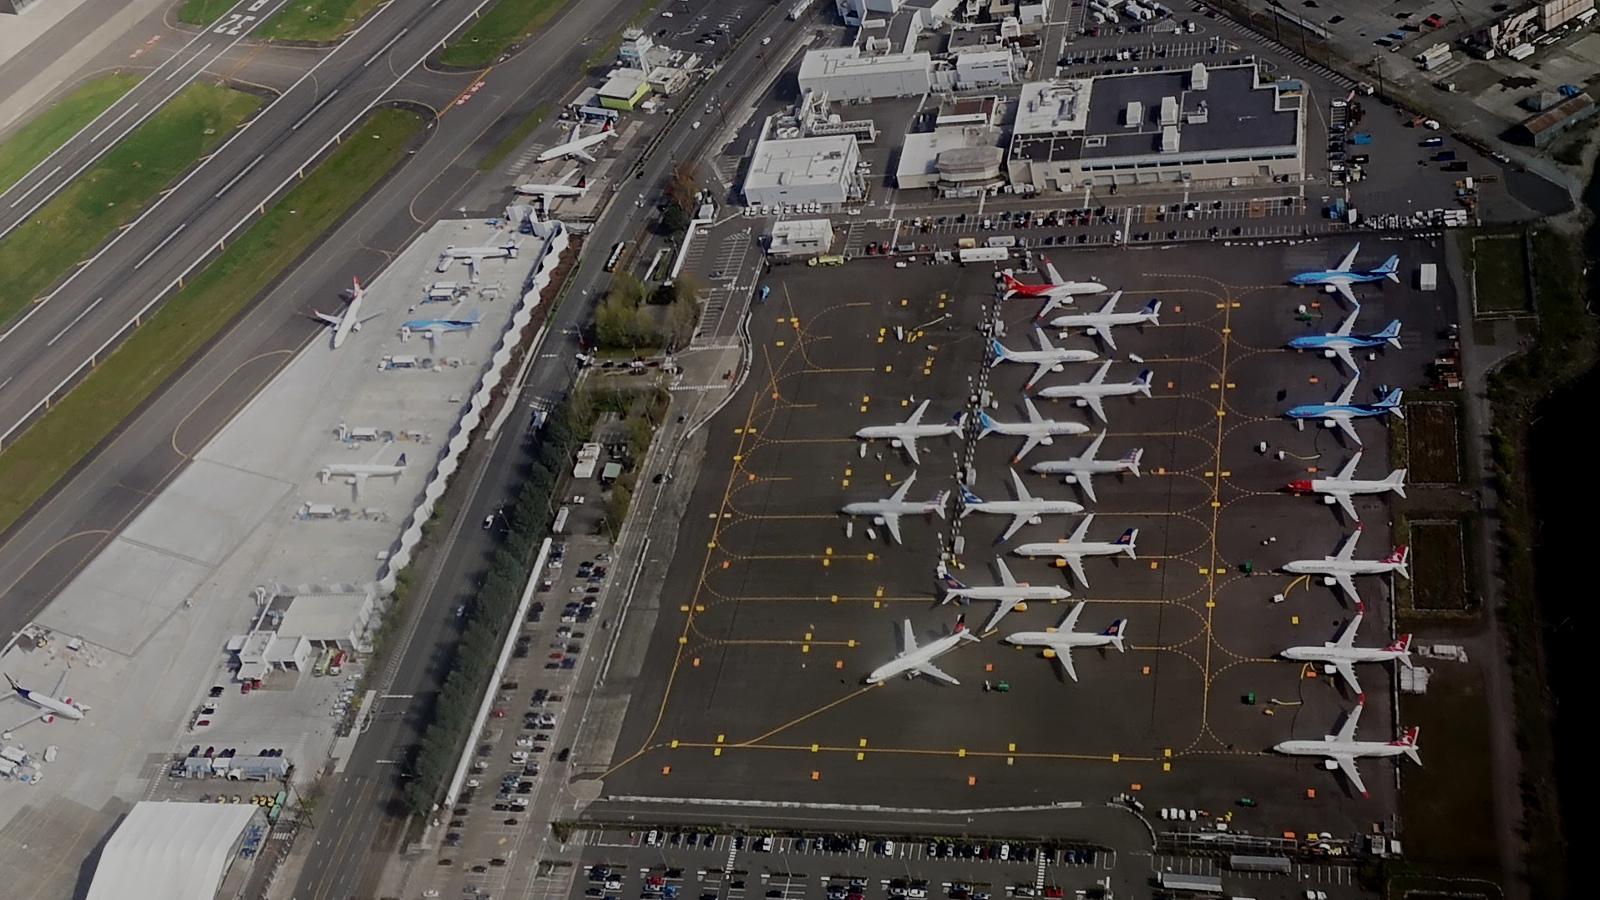 Boeing bläst Milliardendeal mit Embraer ab